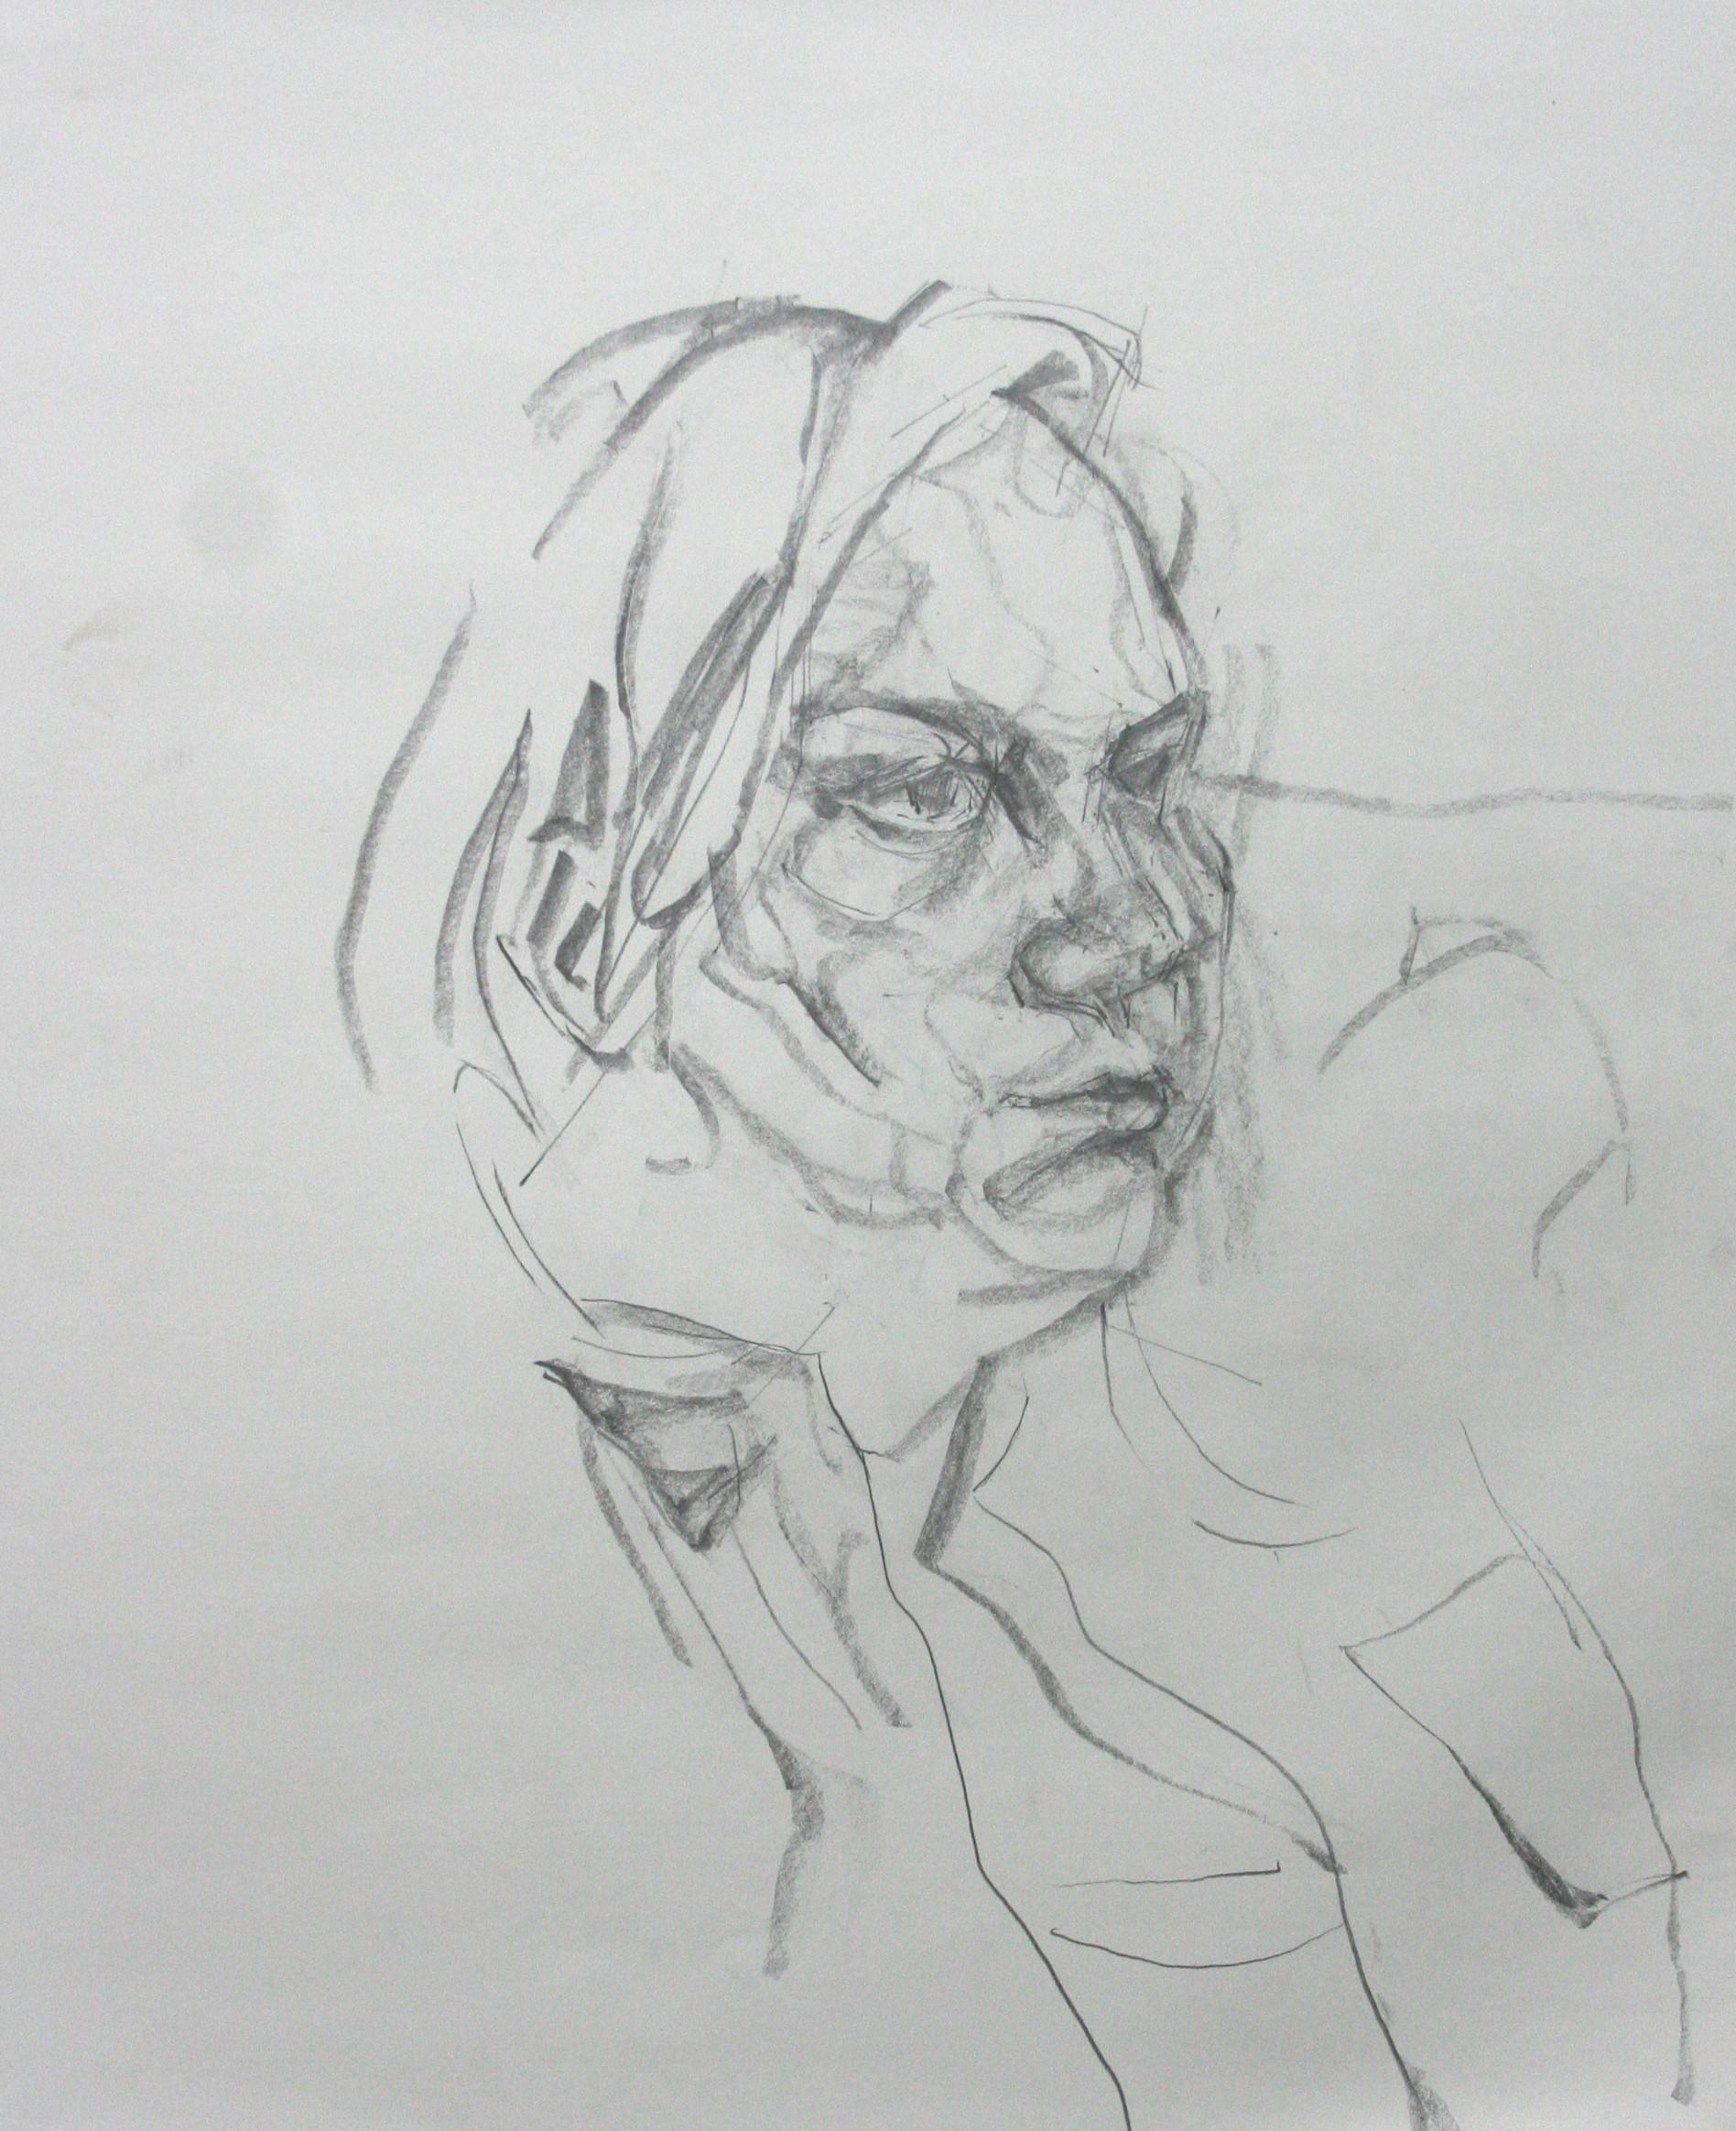 Scott Murphy did this half hour sketch.